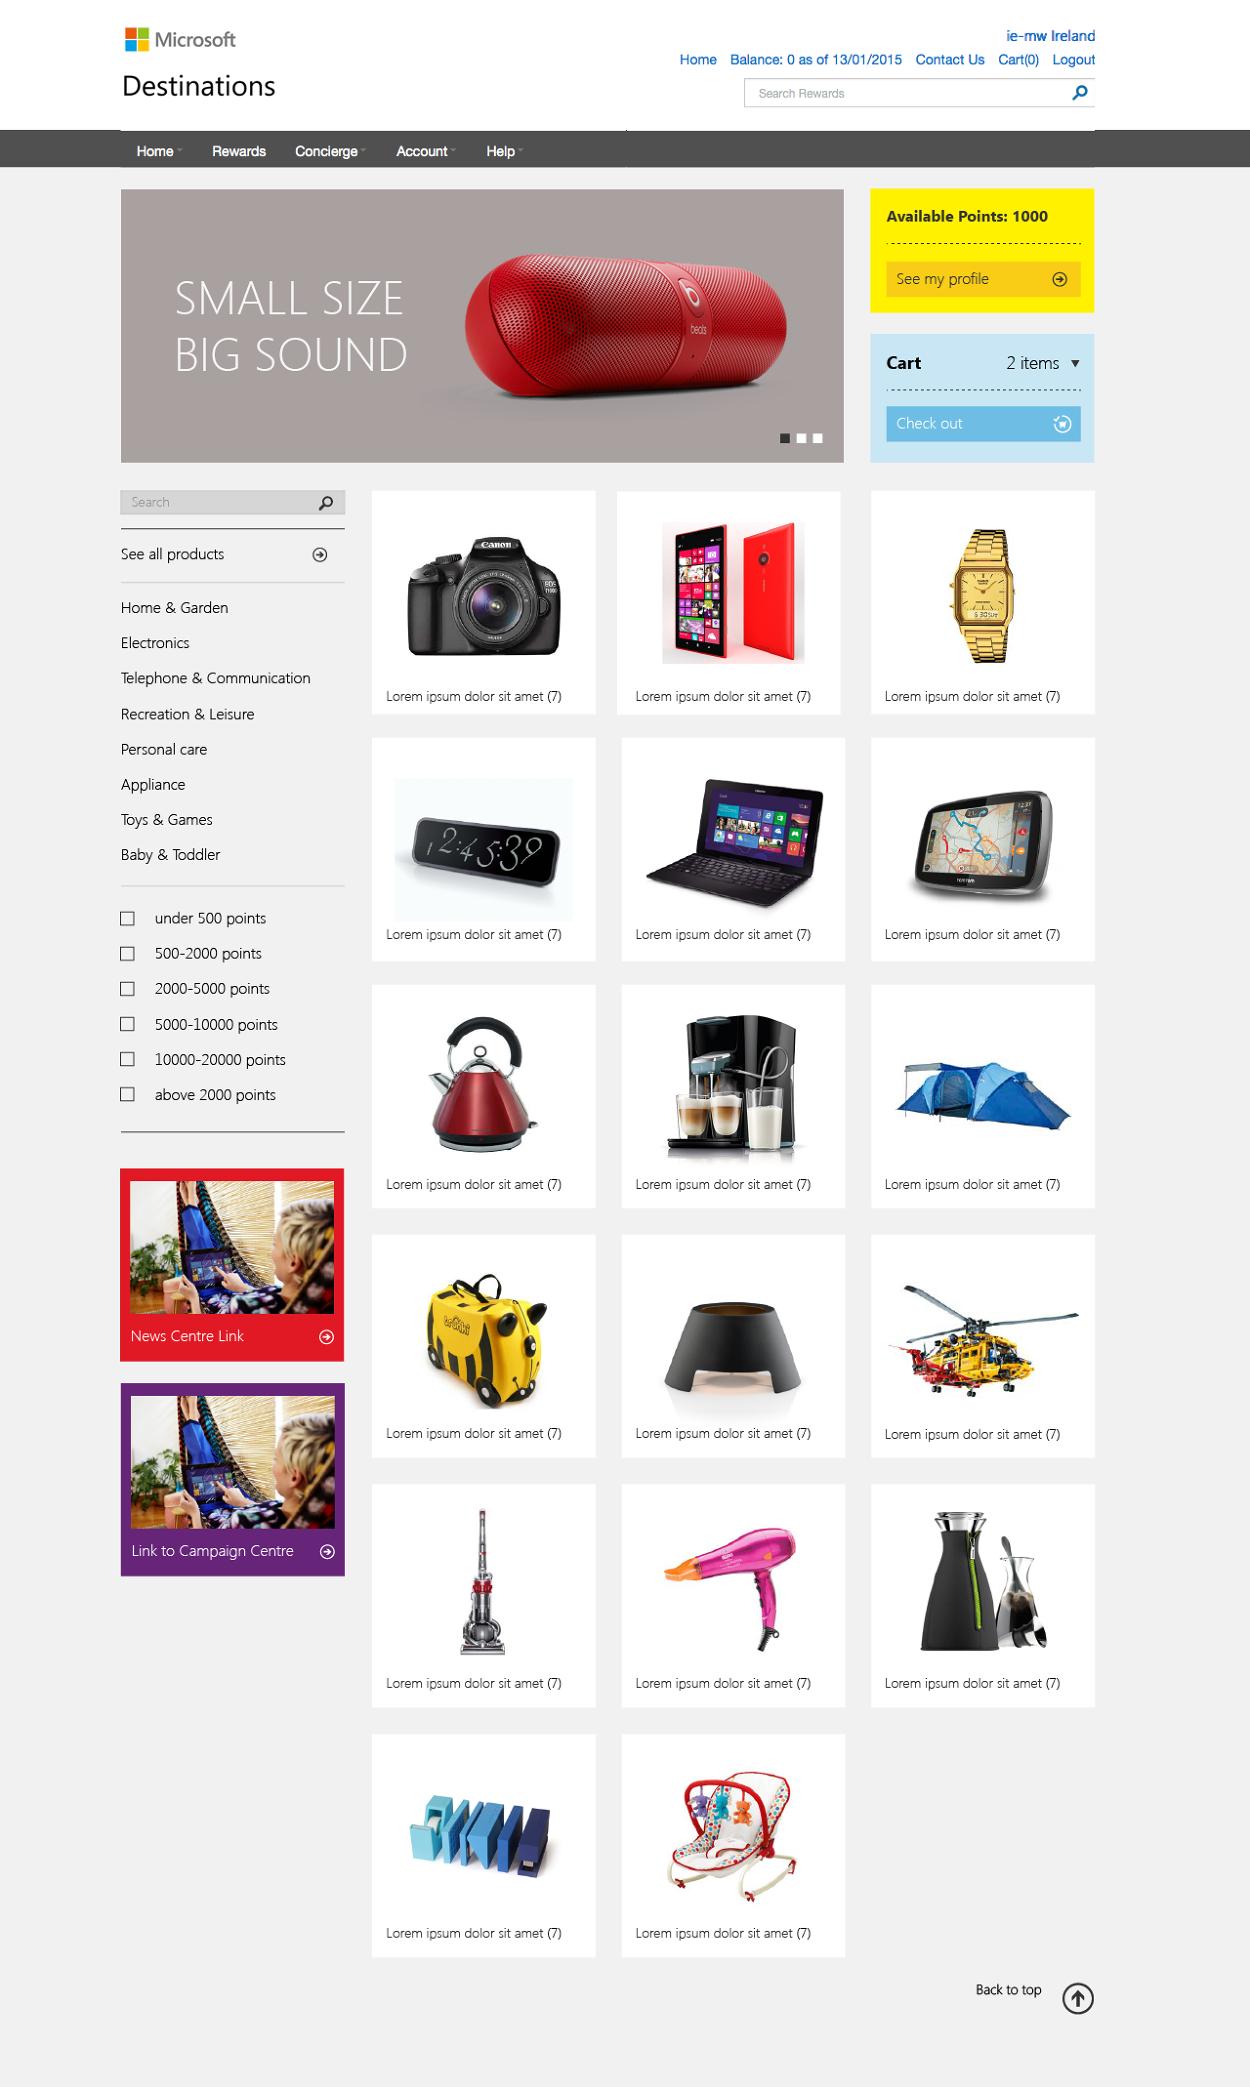 microsoft rewards download pdf